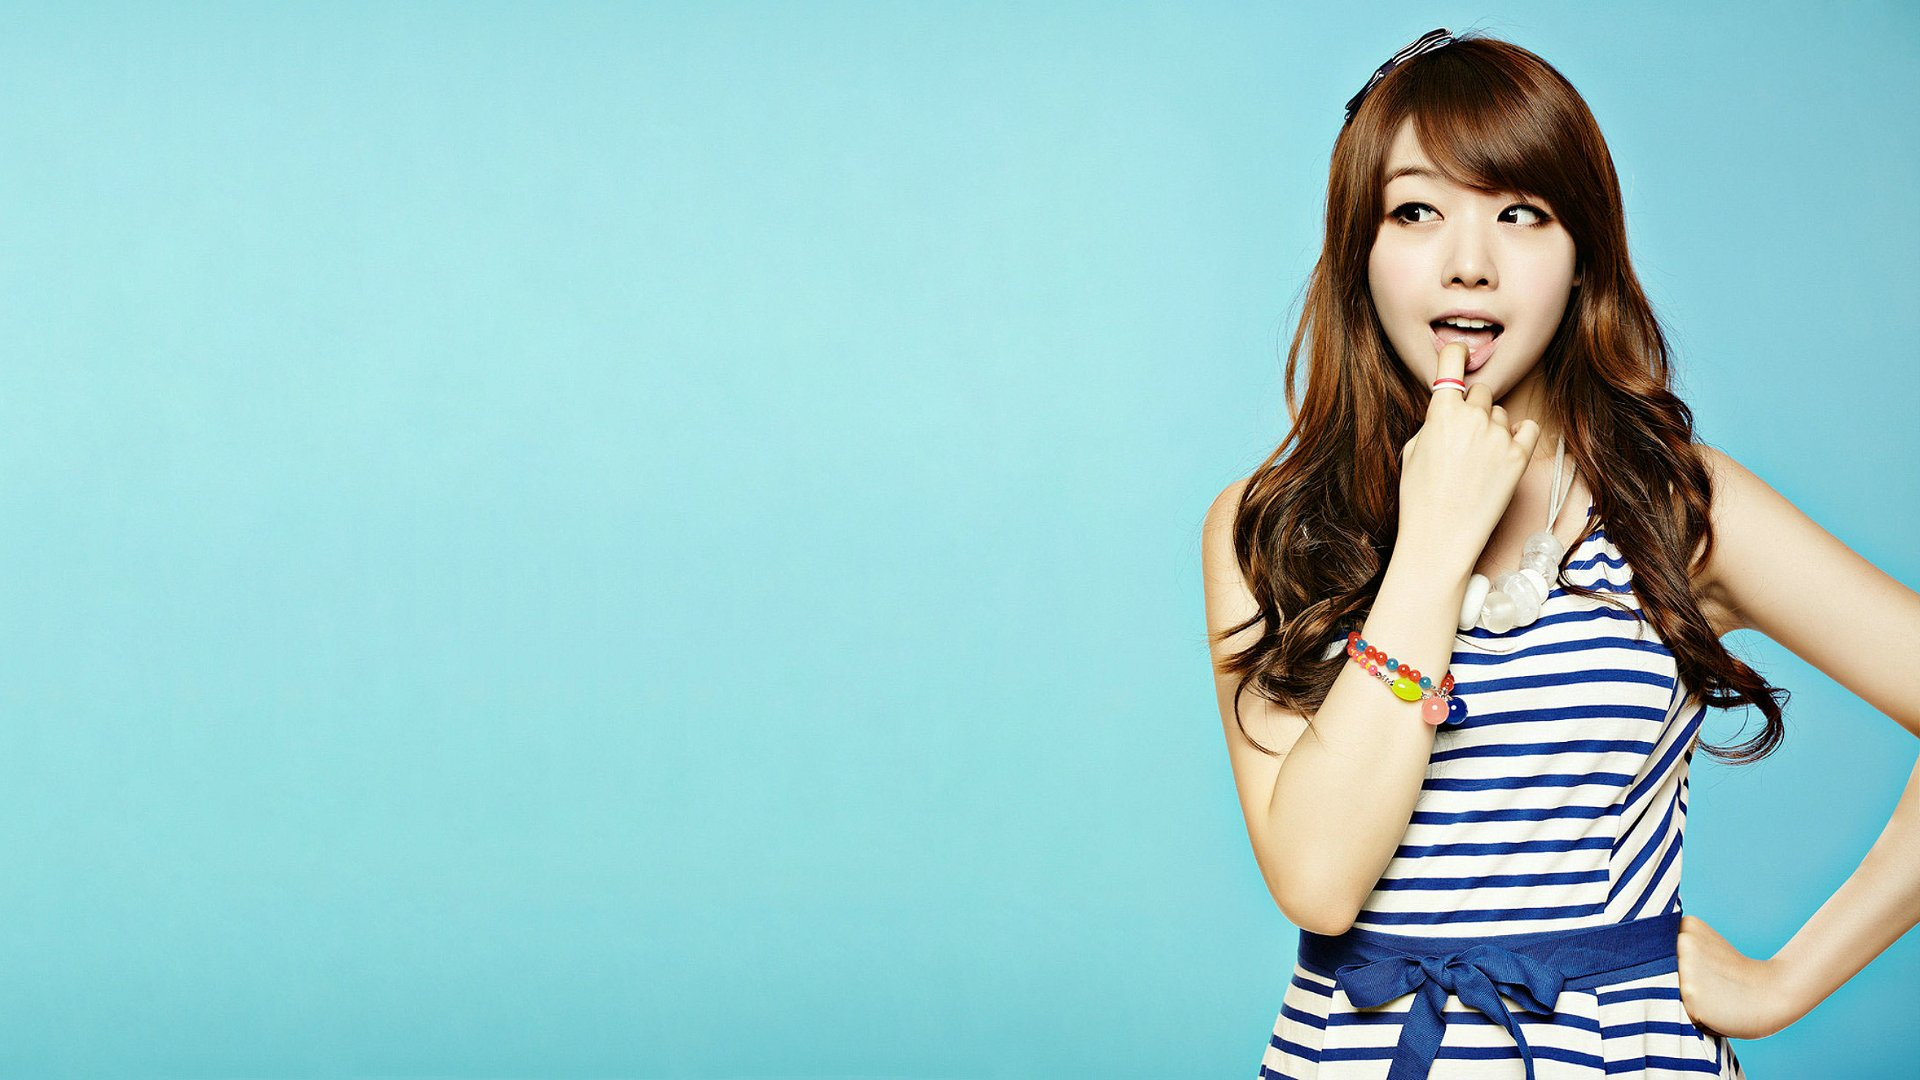 Background Hd Wallpaper Girl Girls Day Dance Pop Kpop K Pop Girls Day Wallpaper